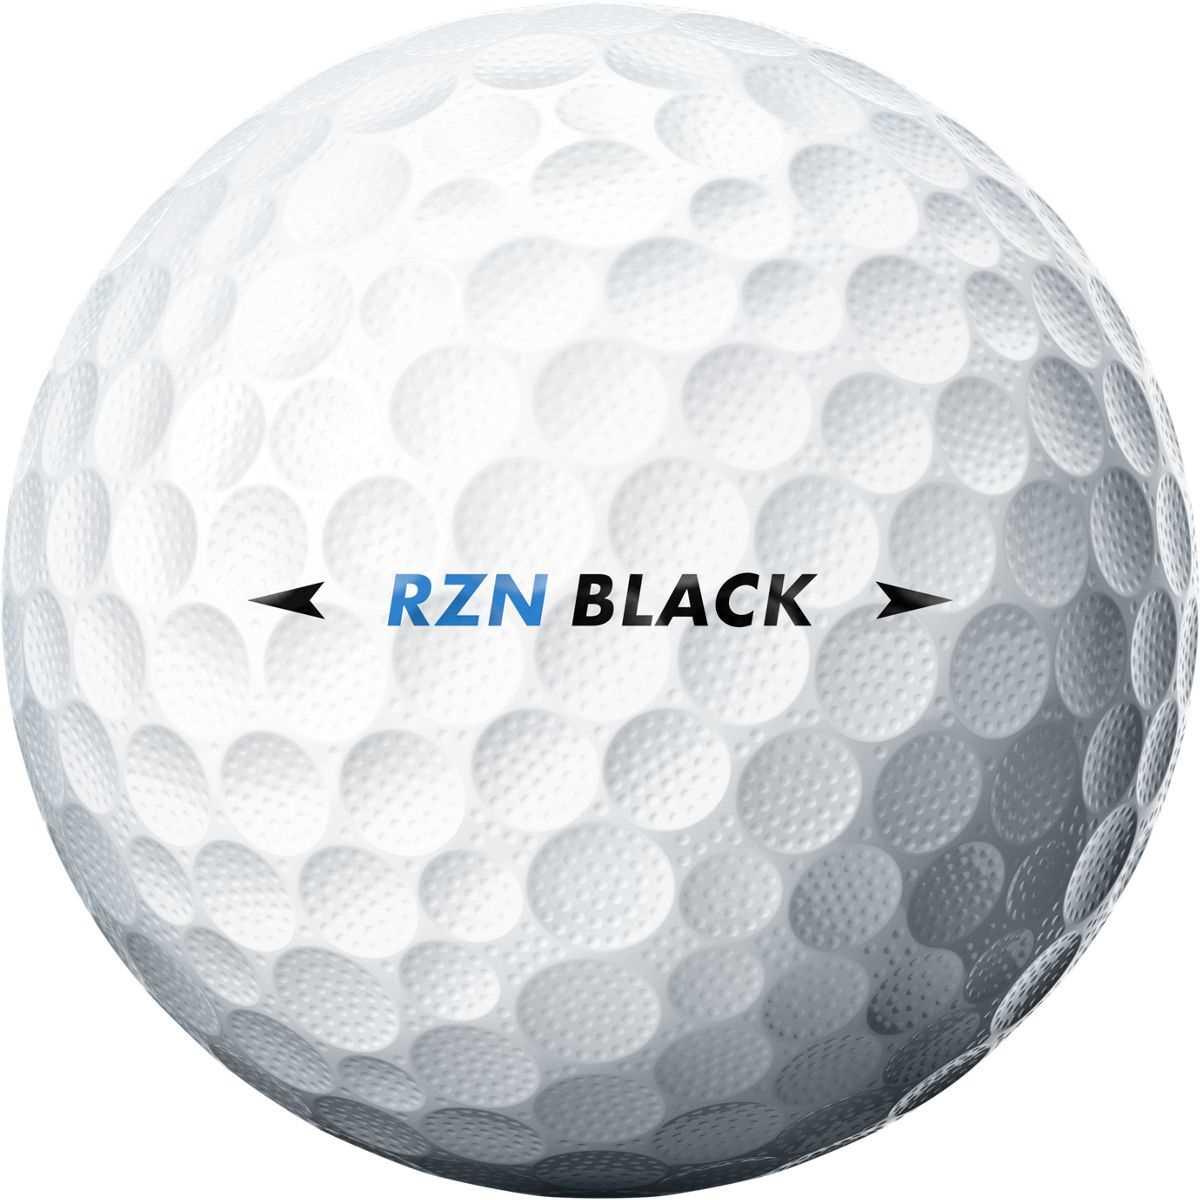 Nike RZN Tour Black Golf Balls (1 DZ) Volt - White e7b29ba98b